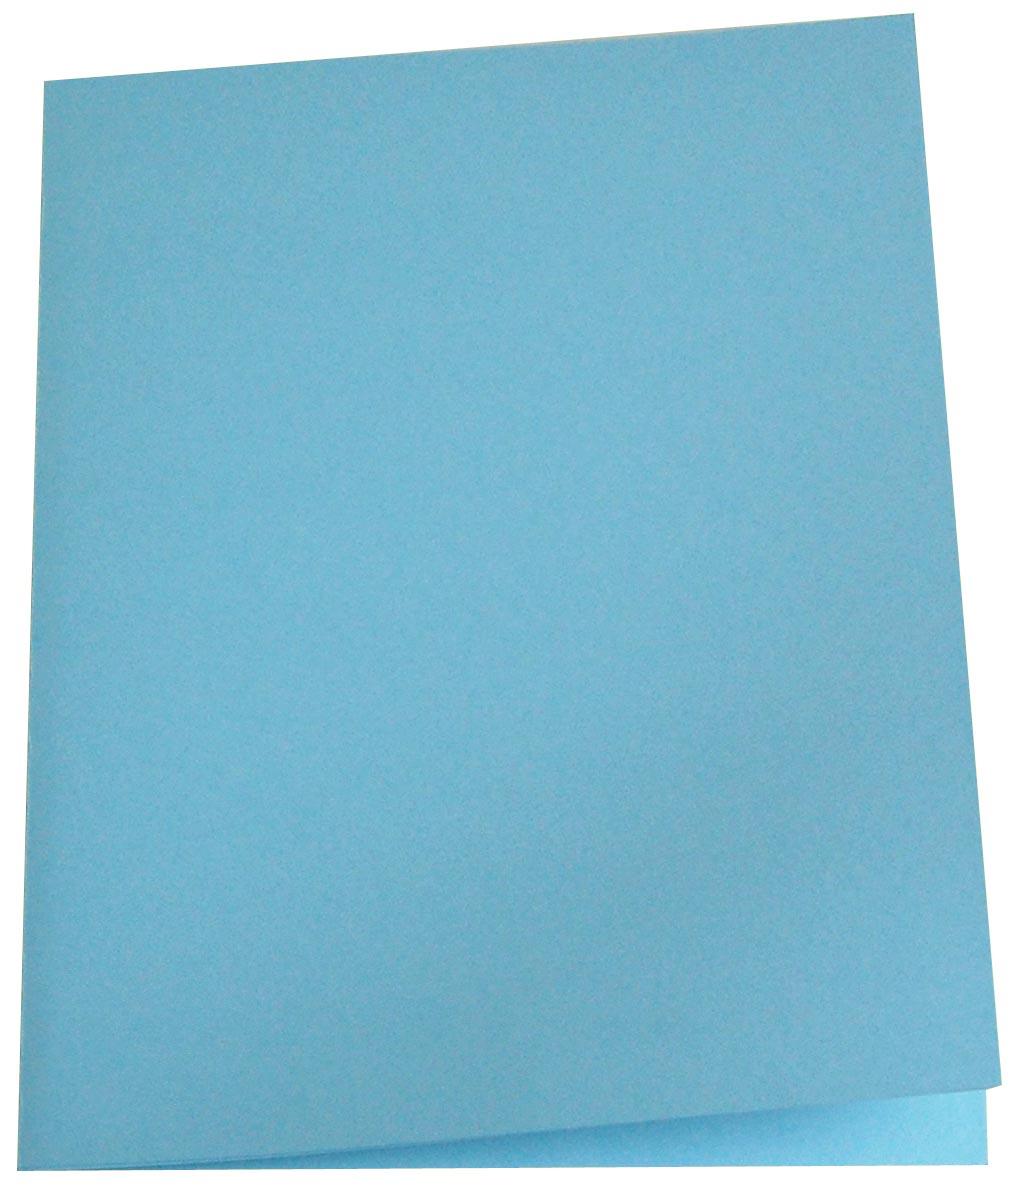 5 Star dossiermap blauw, pak van 100